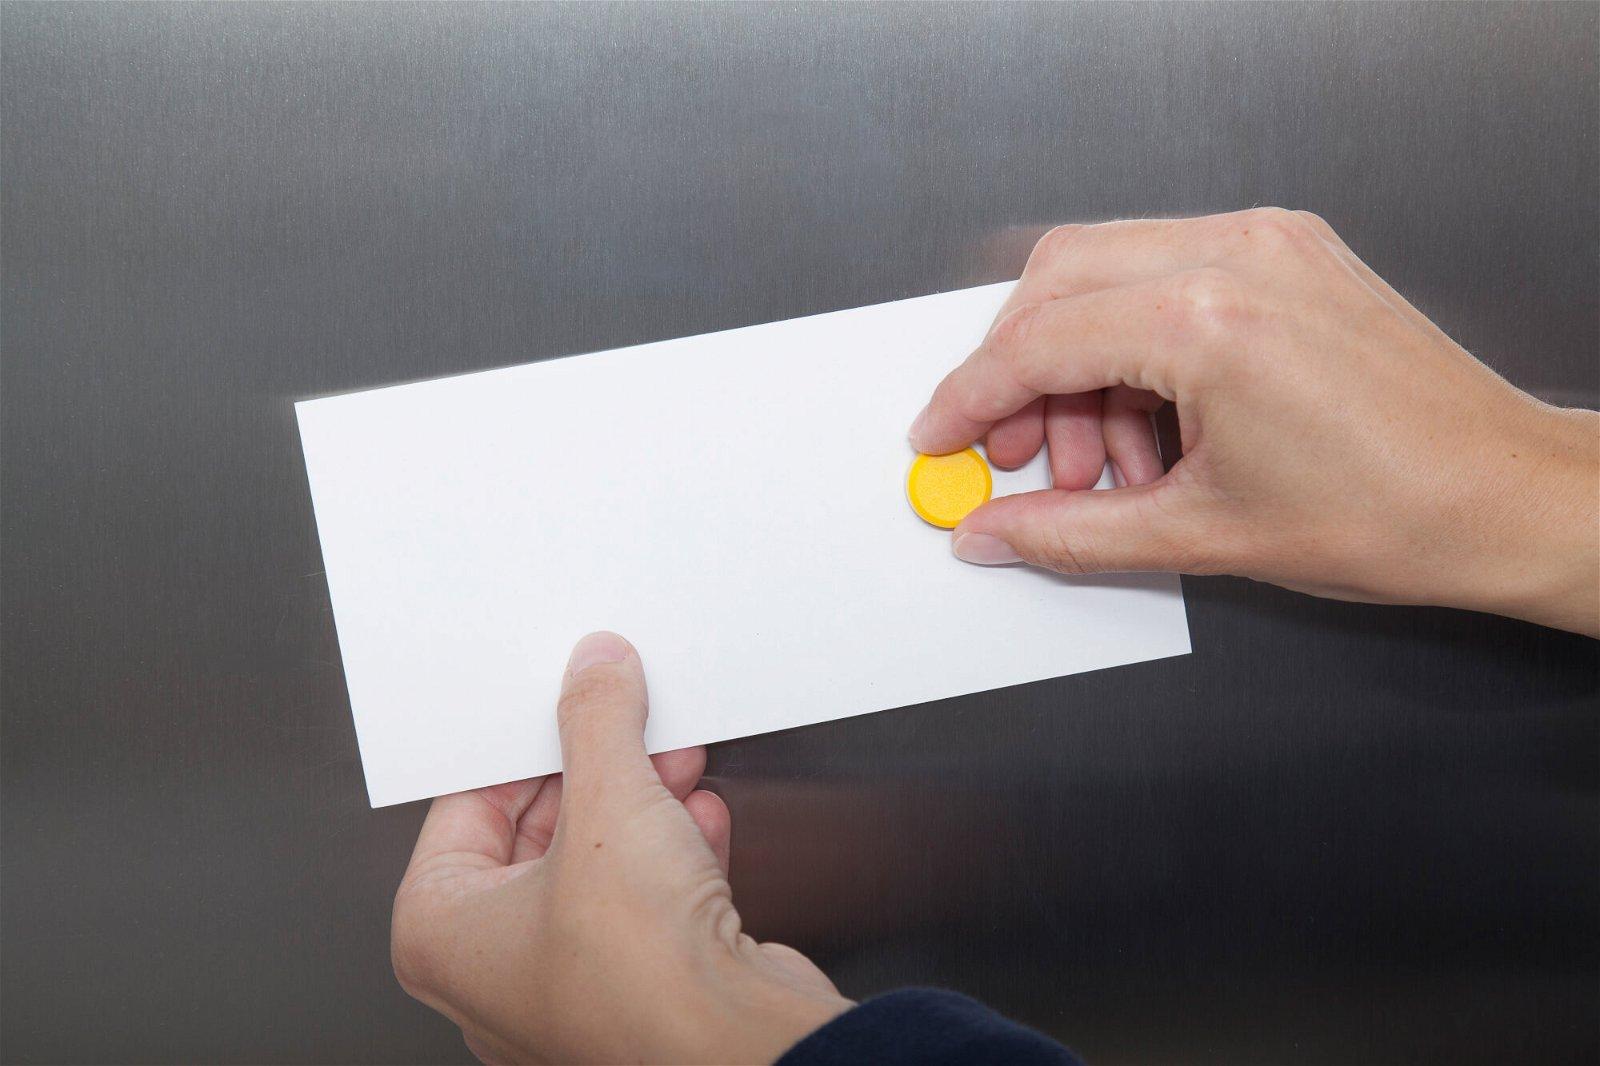 Facetterand-Magnet MAULpro Ø 20 mm, 0,3 kg, 20 St./Set, gelb